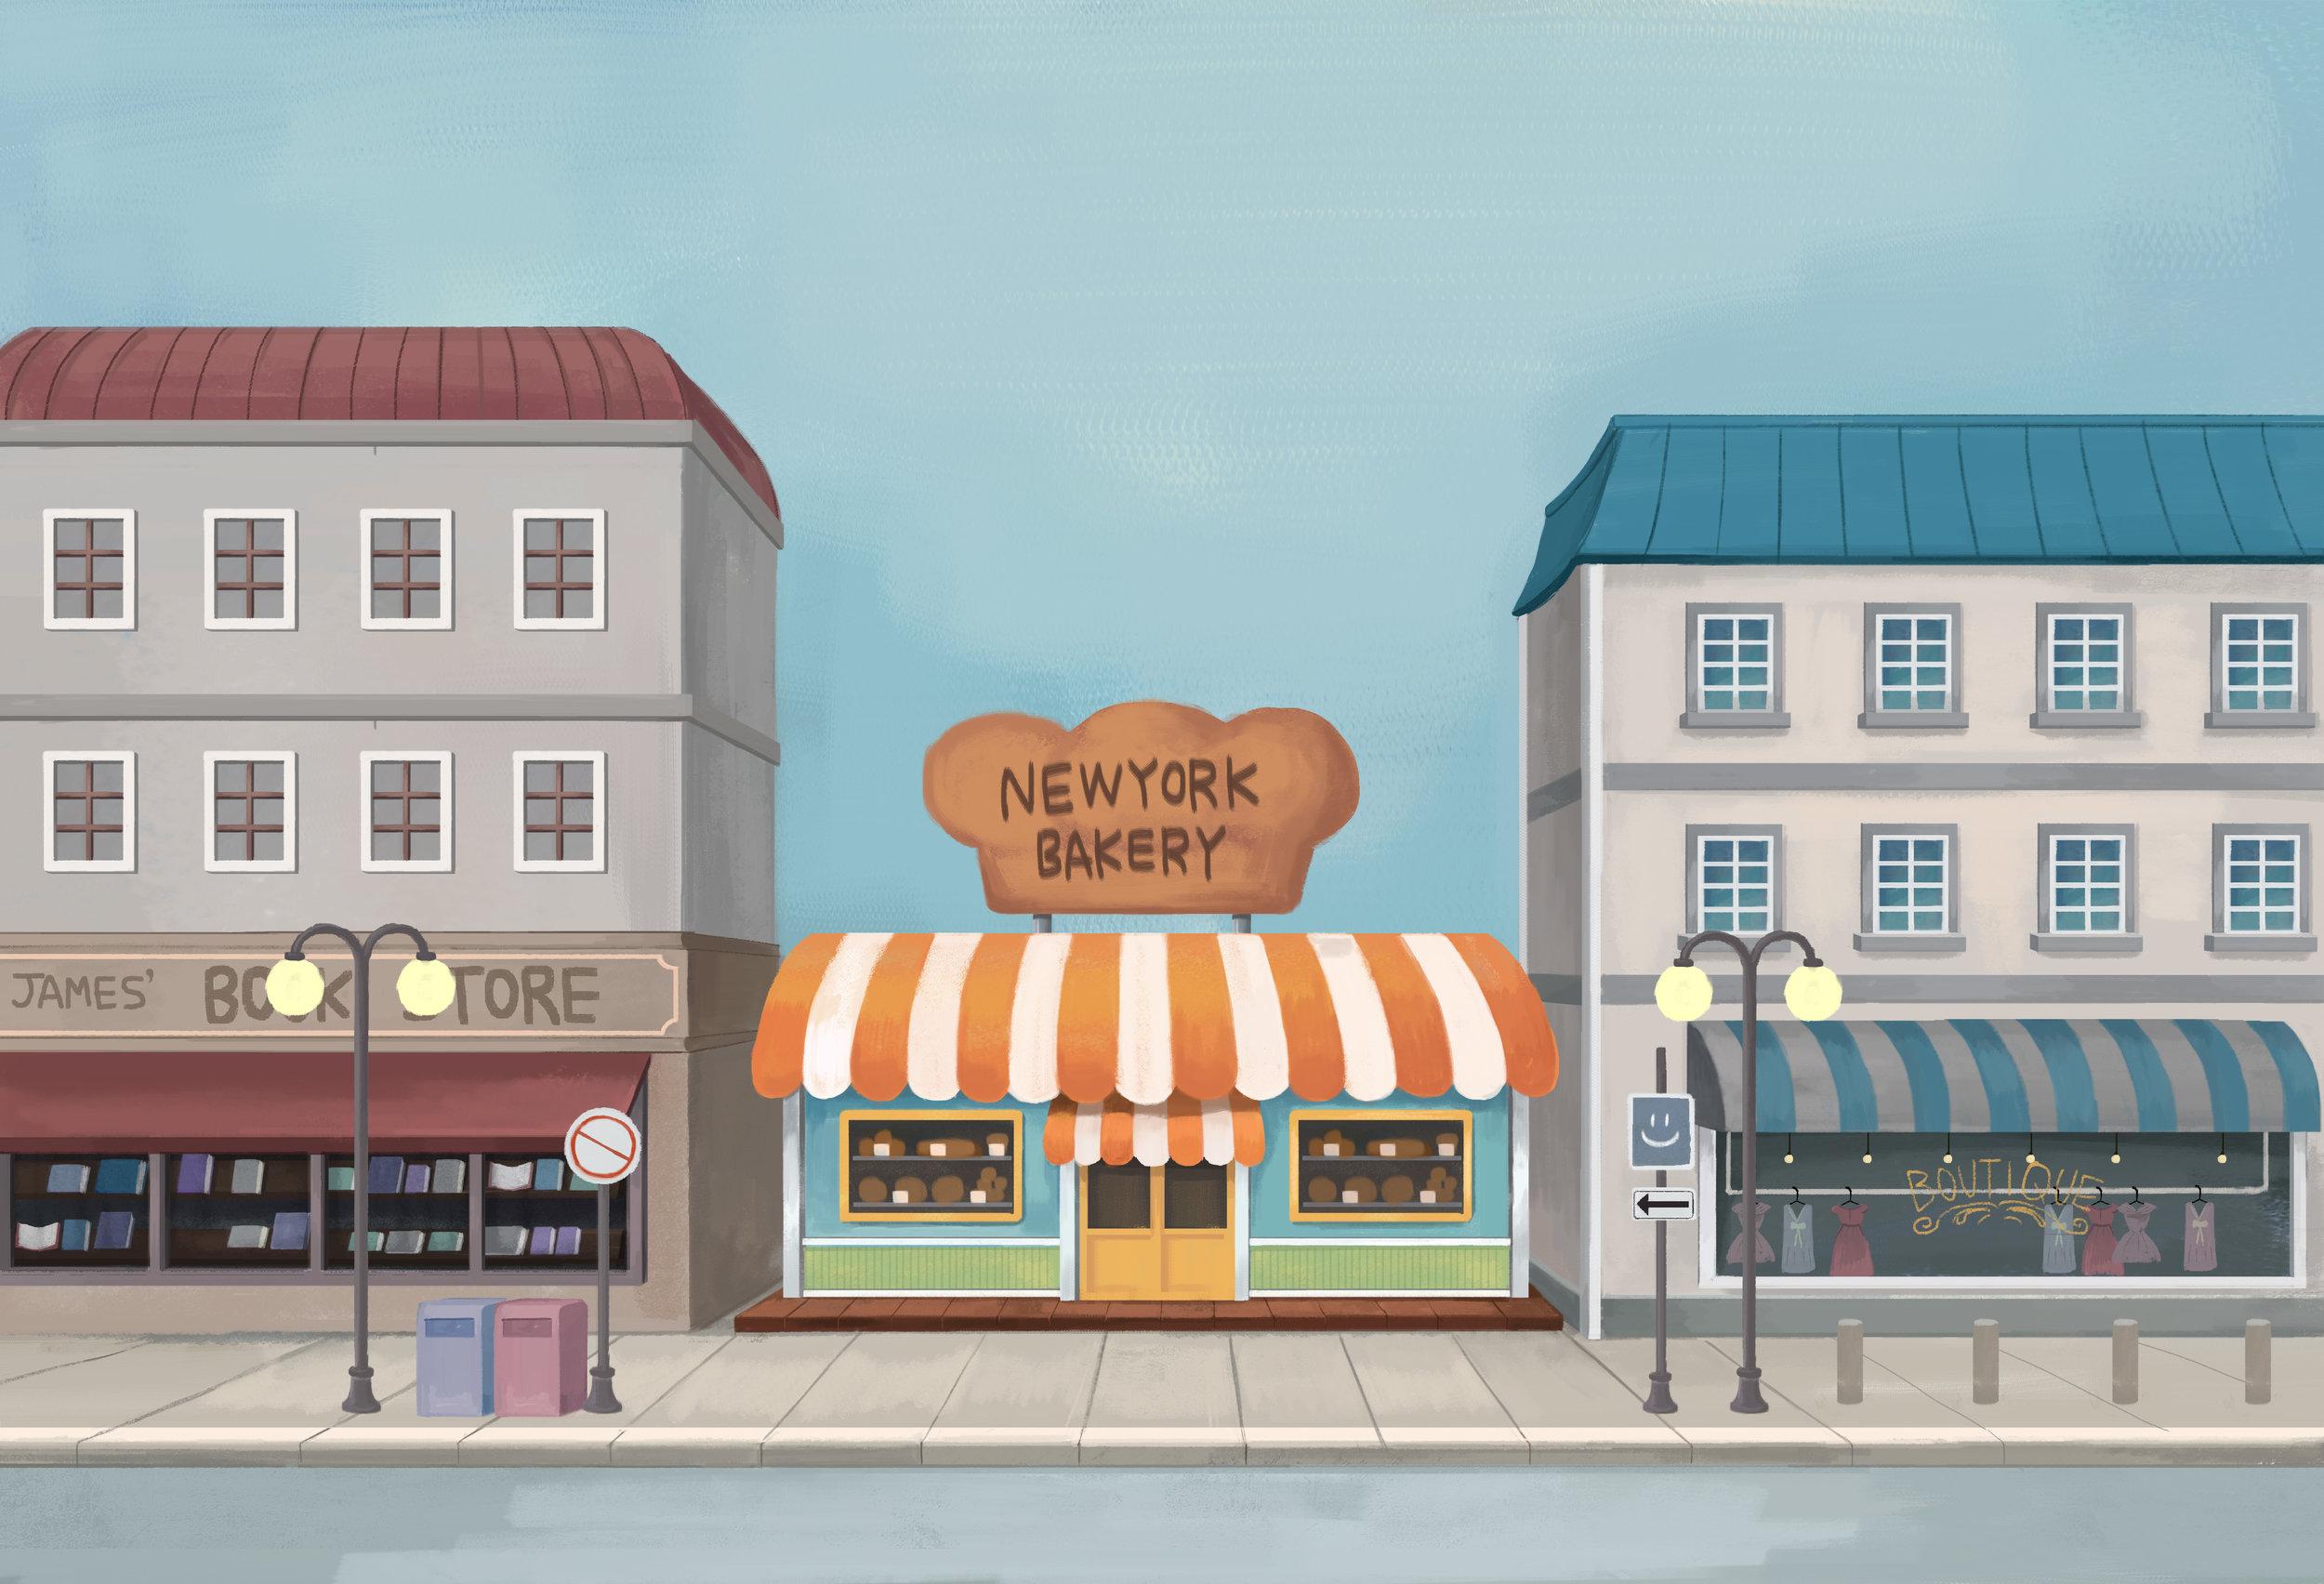 Bakery_Street view